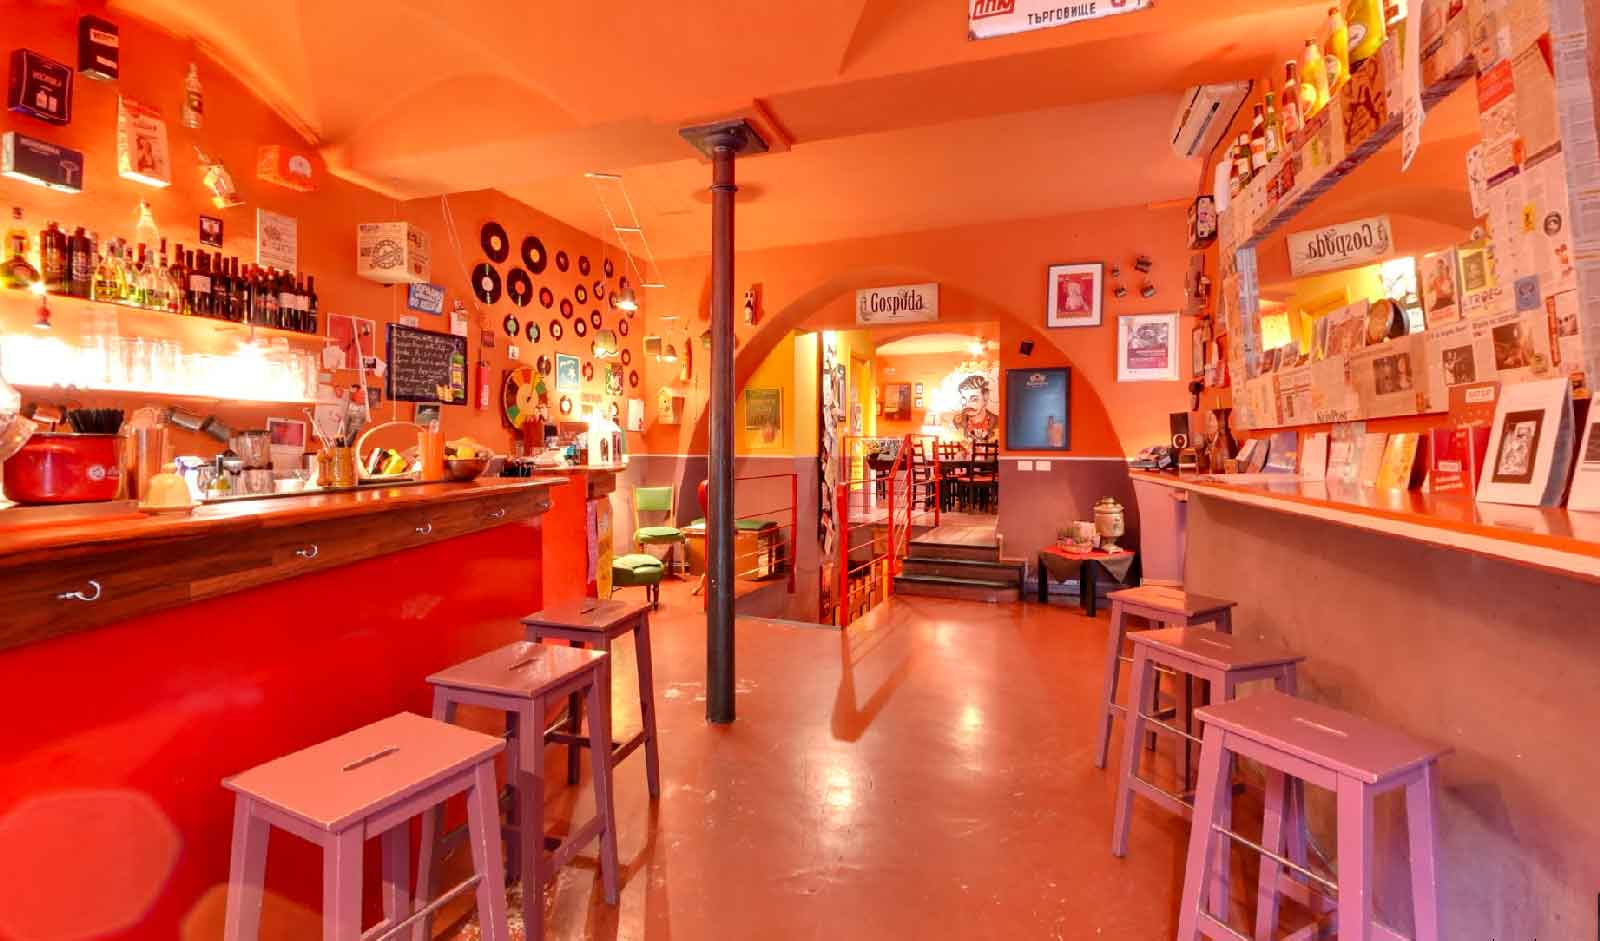 Kowalski – Ristorante e Pub dall'Est Europa – Street View